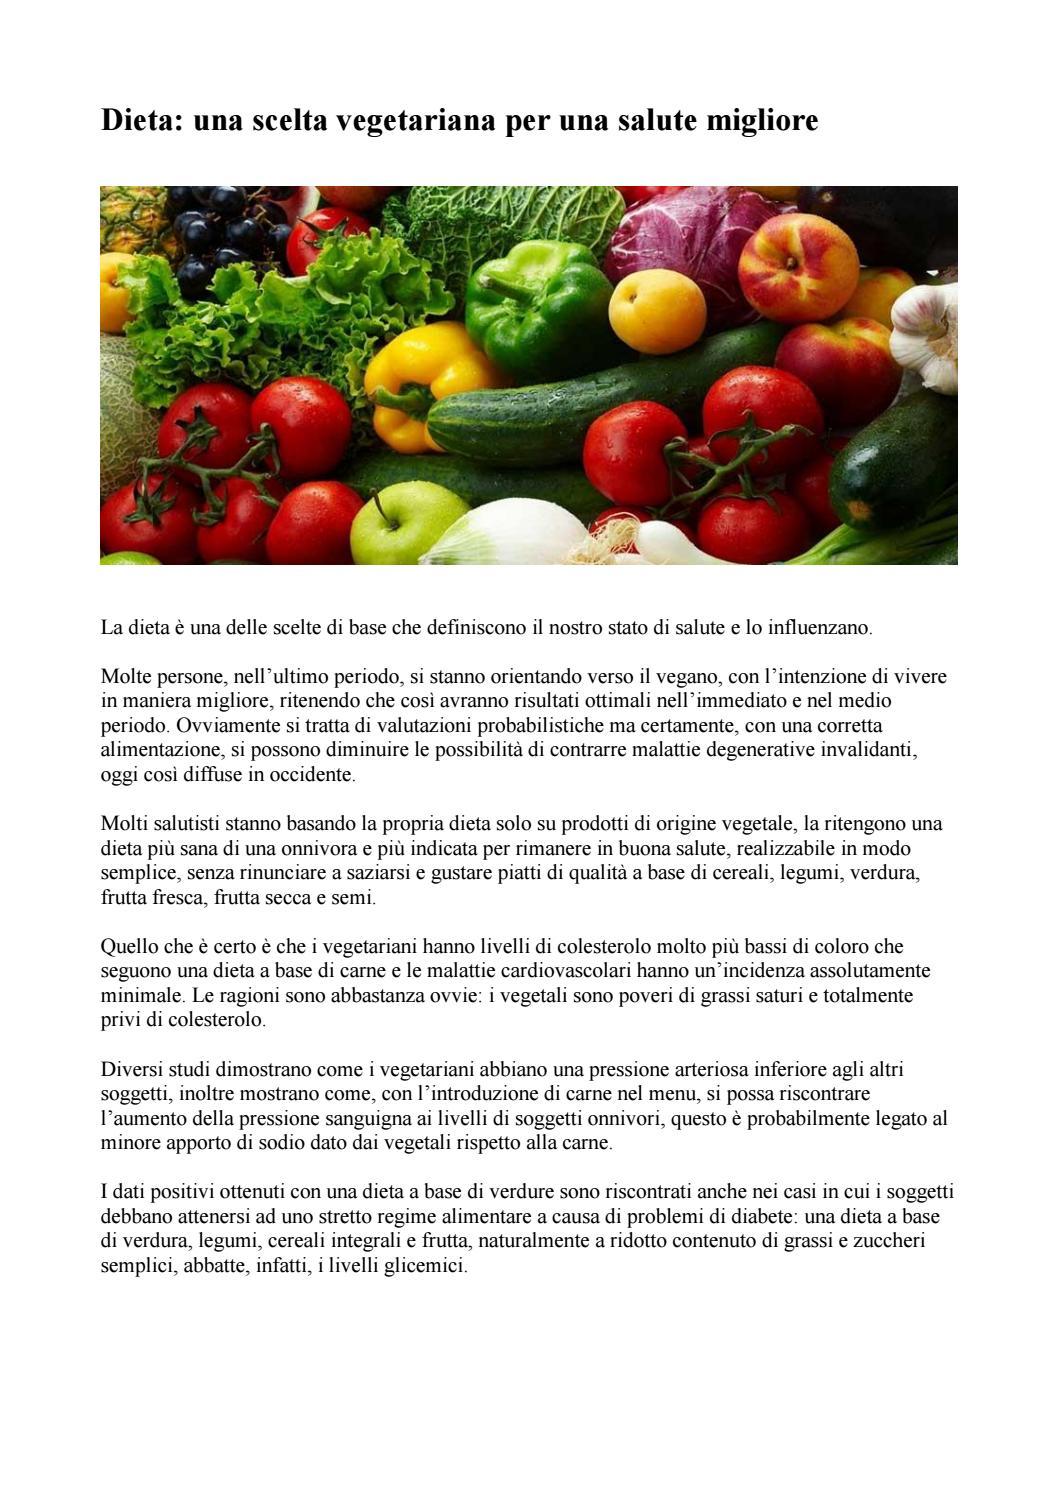 come è la dieta vegetariana